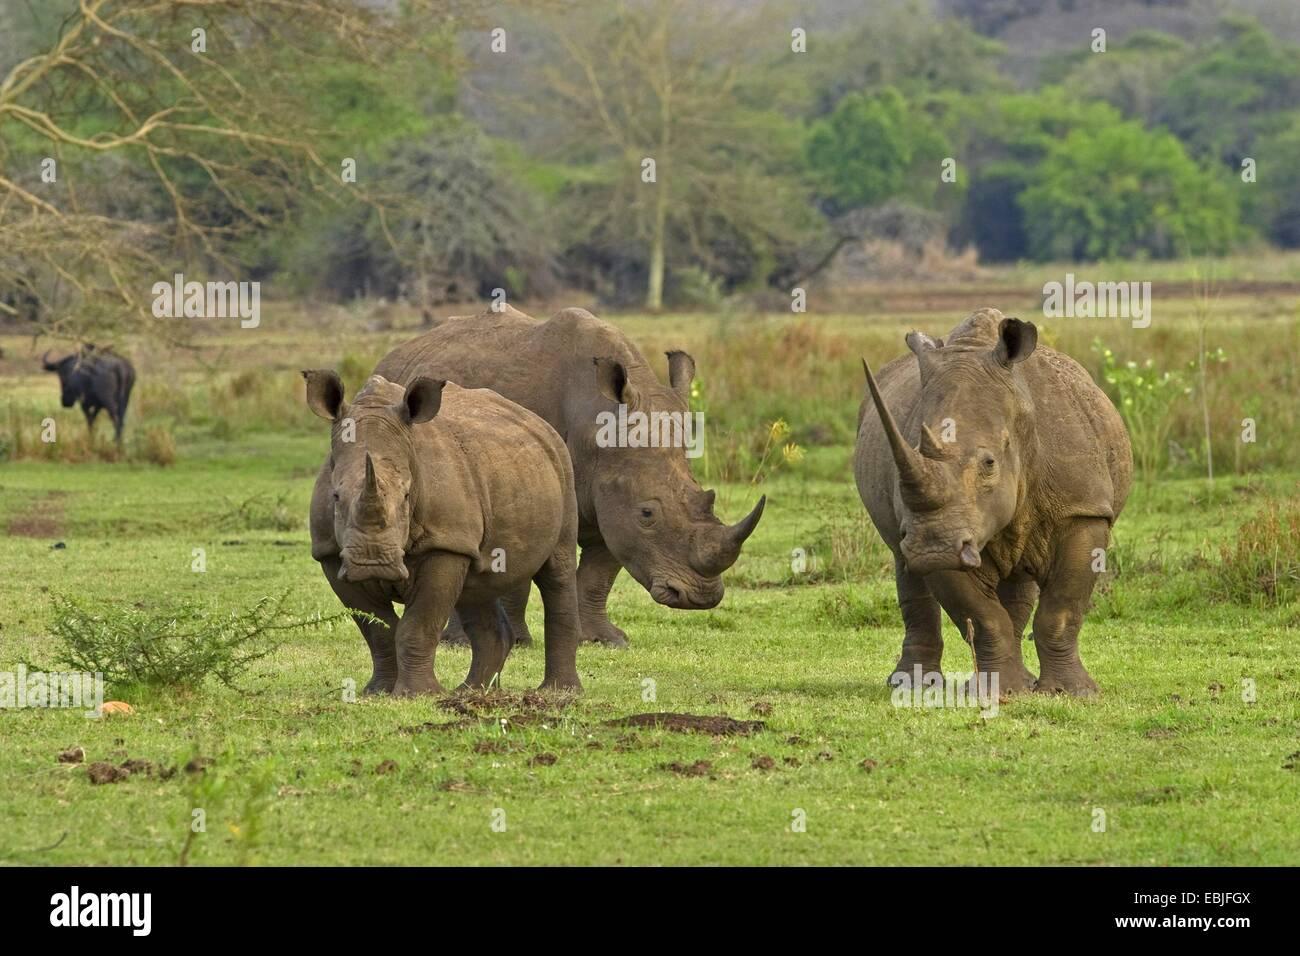 white rhinoceros, square-lipped rhinoceros, grass rhinoceros (Ceratotherium simum), three rhinocerosses in green - Stock Photo